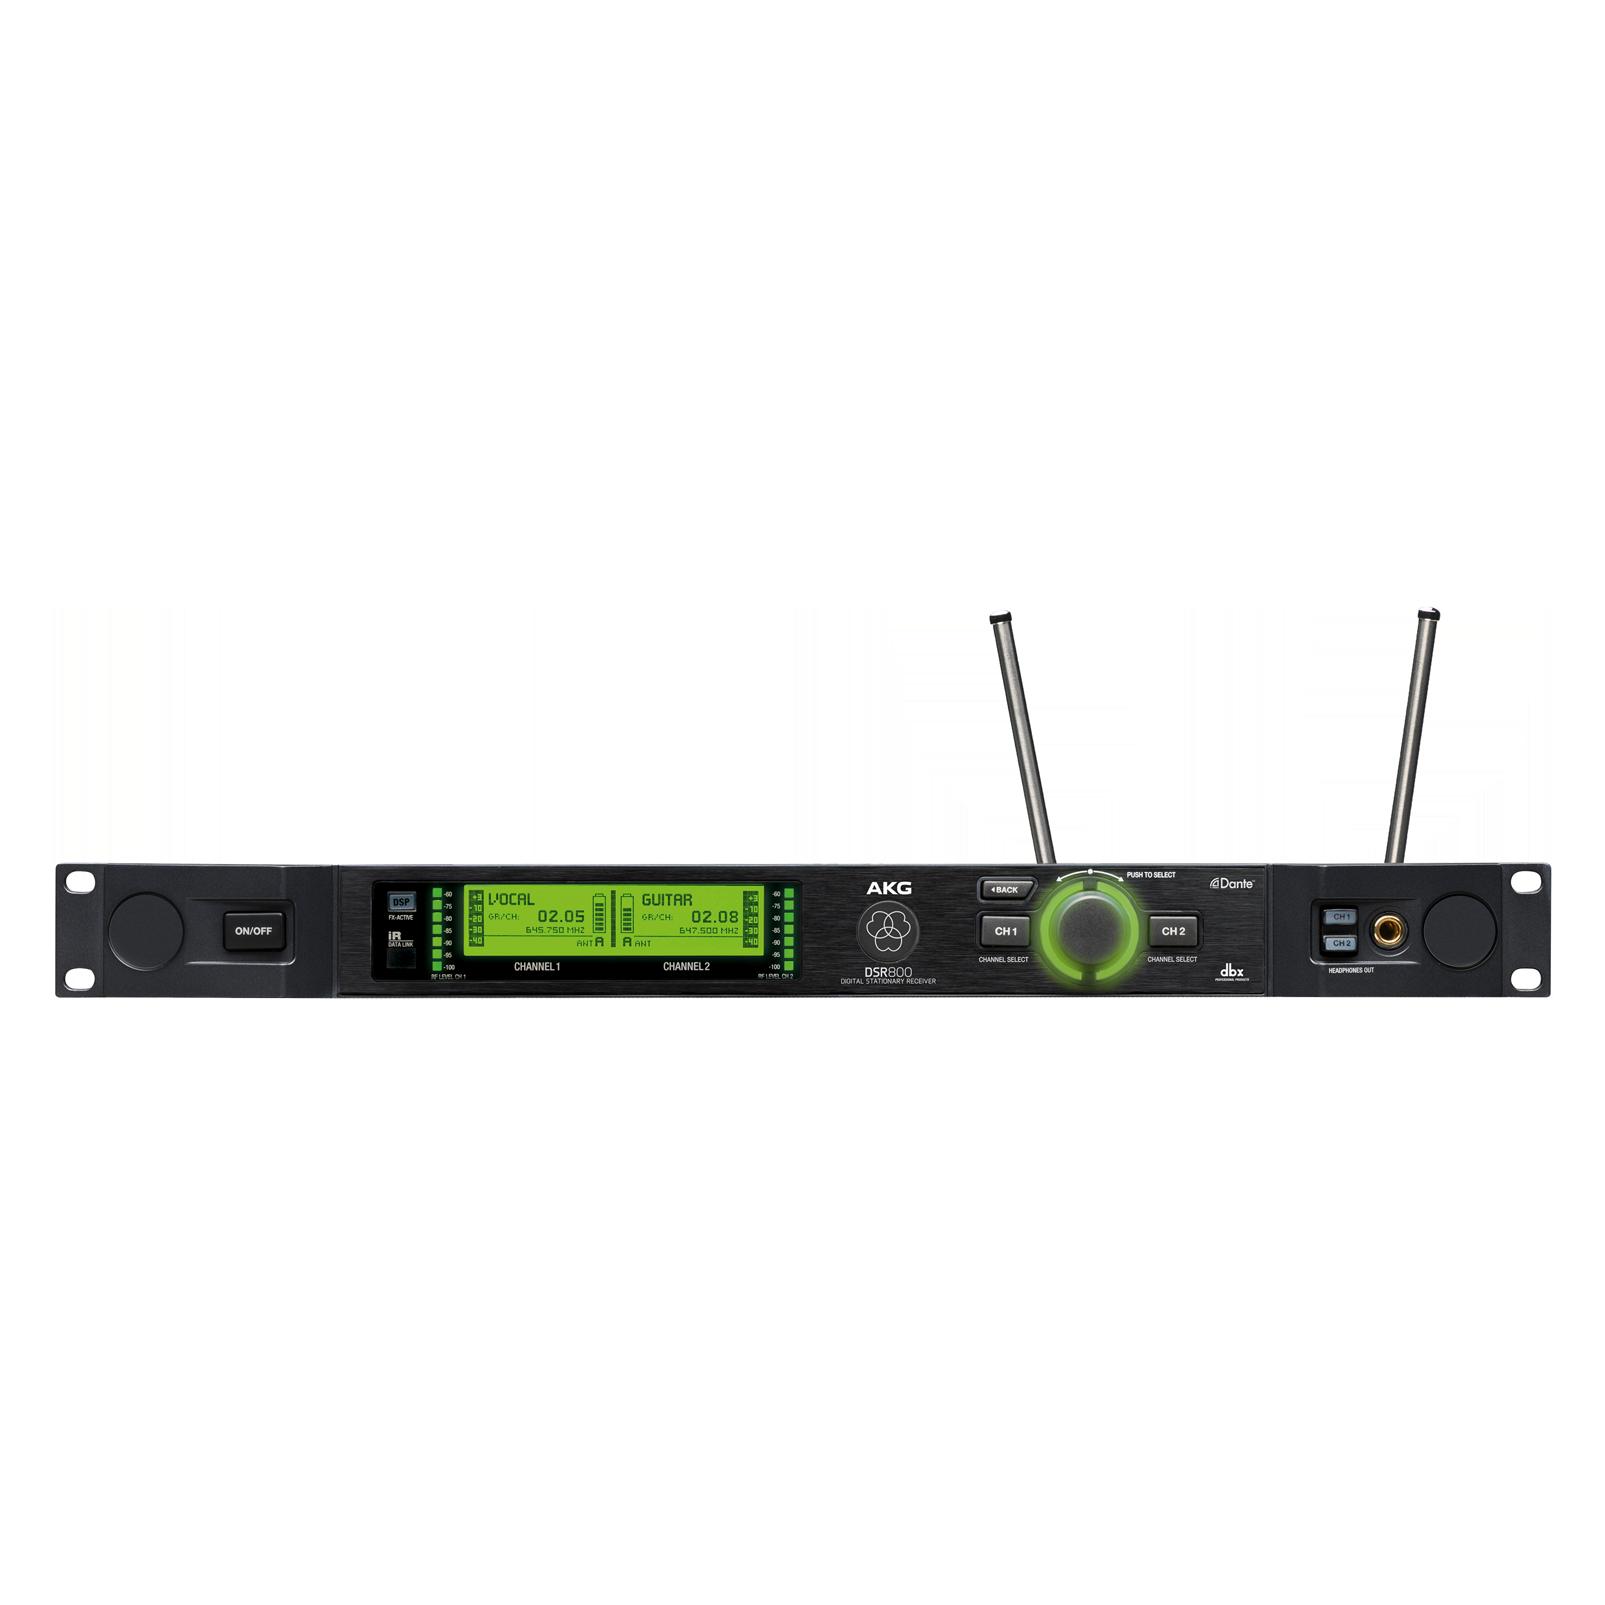 DSR800 Band1